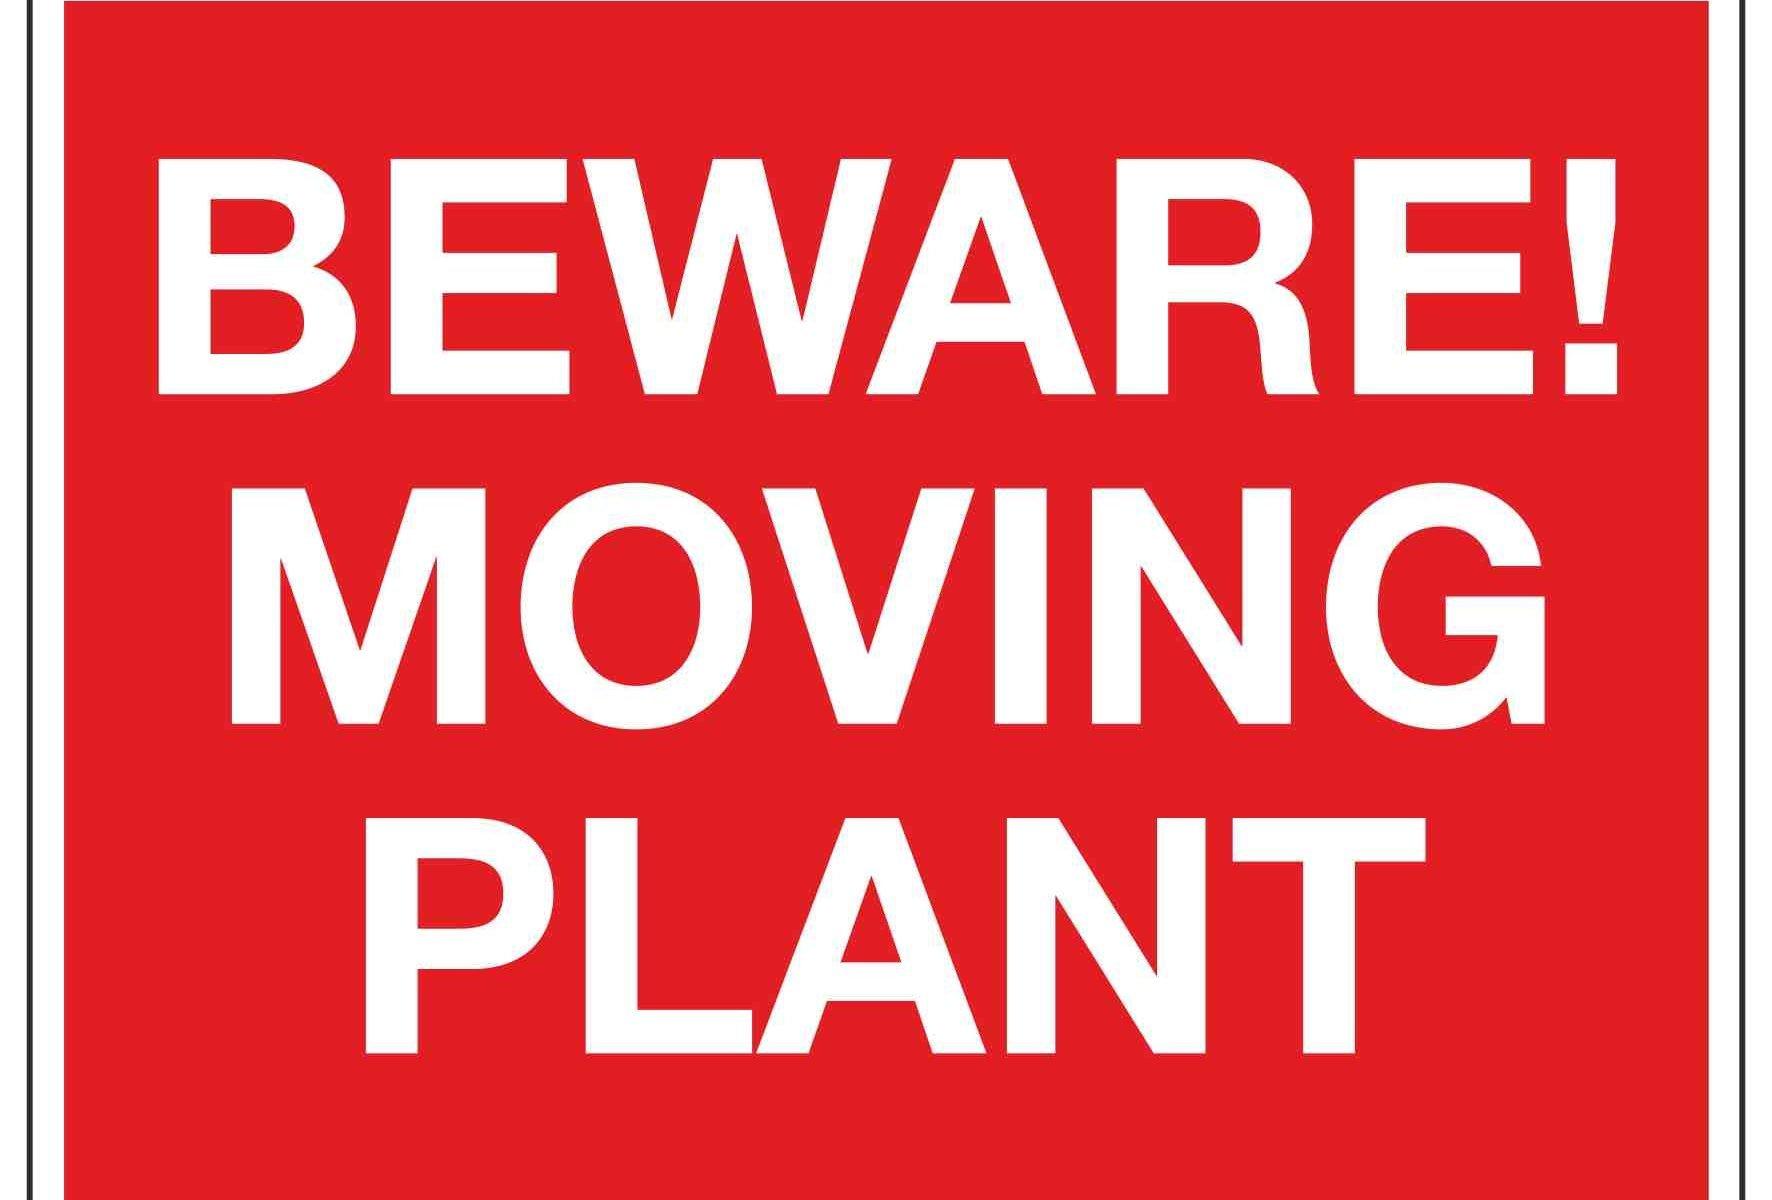 BEWARE! MOVING PLANT